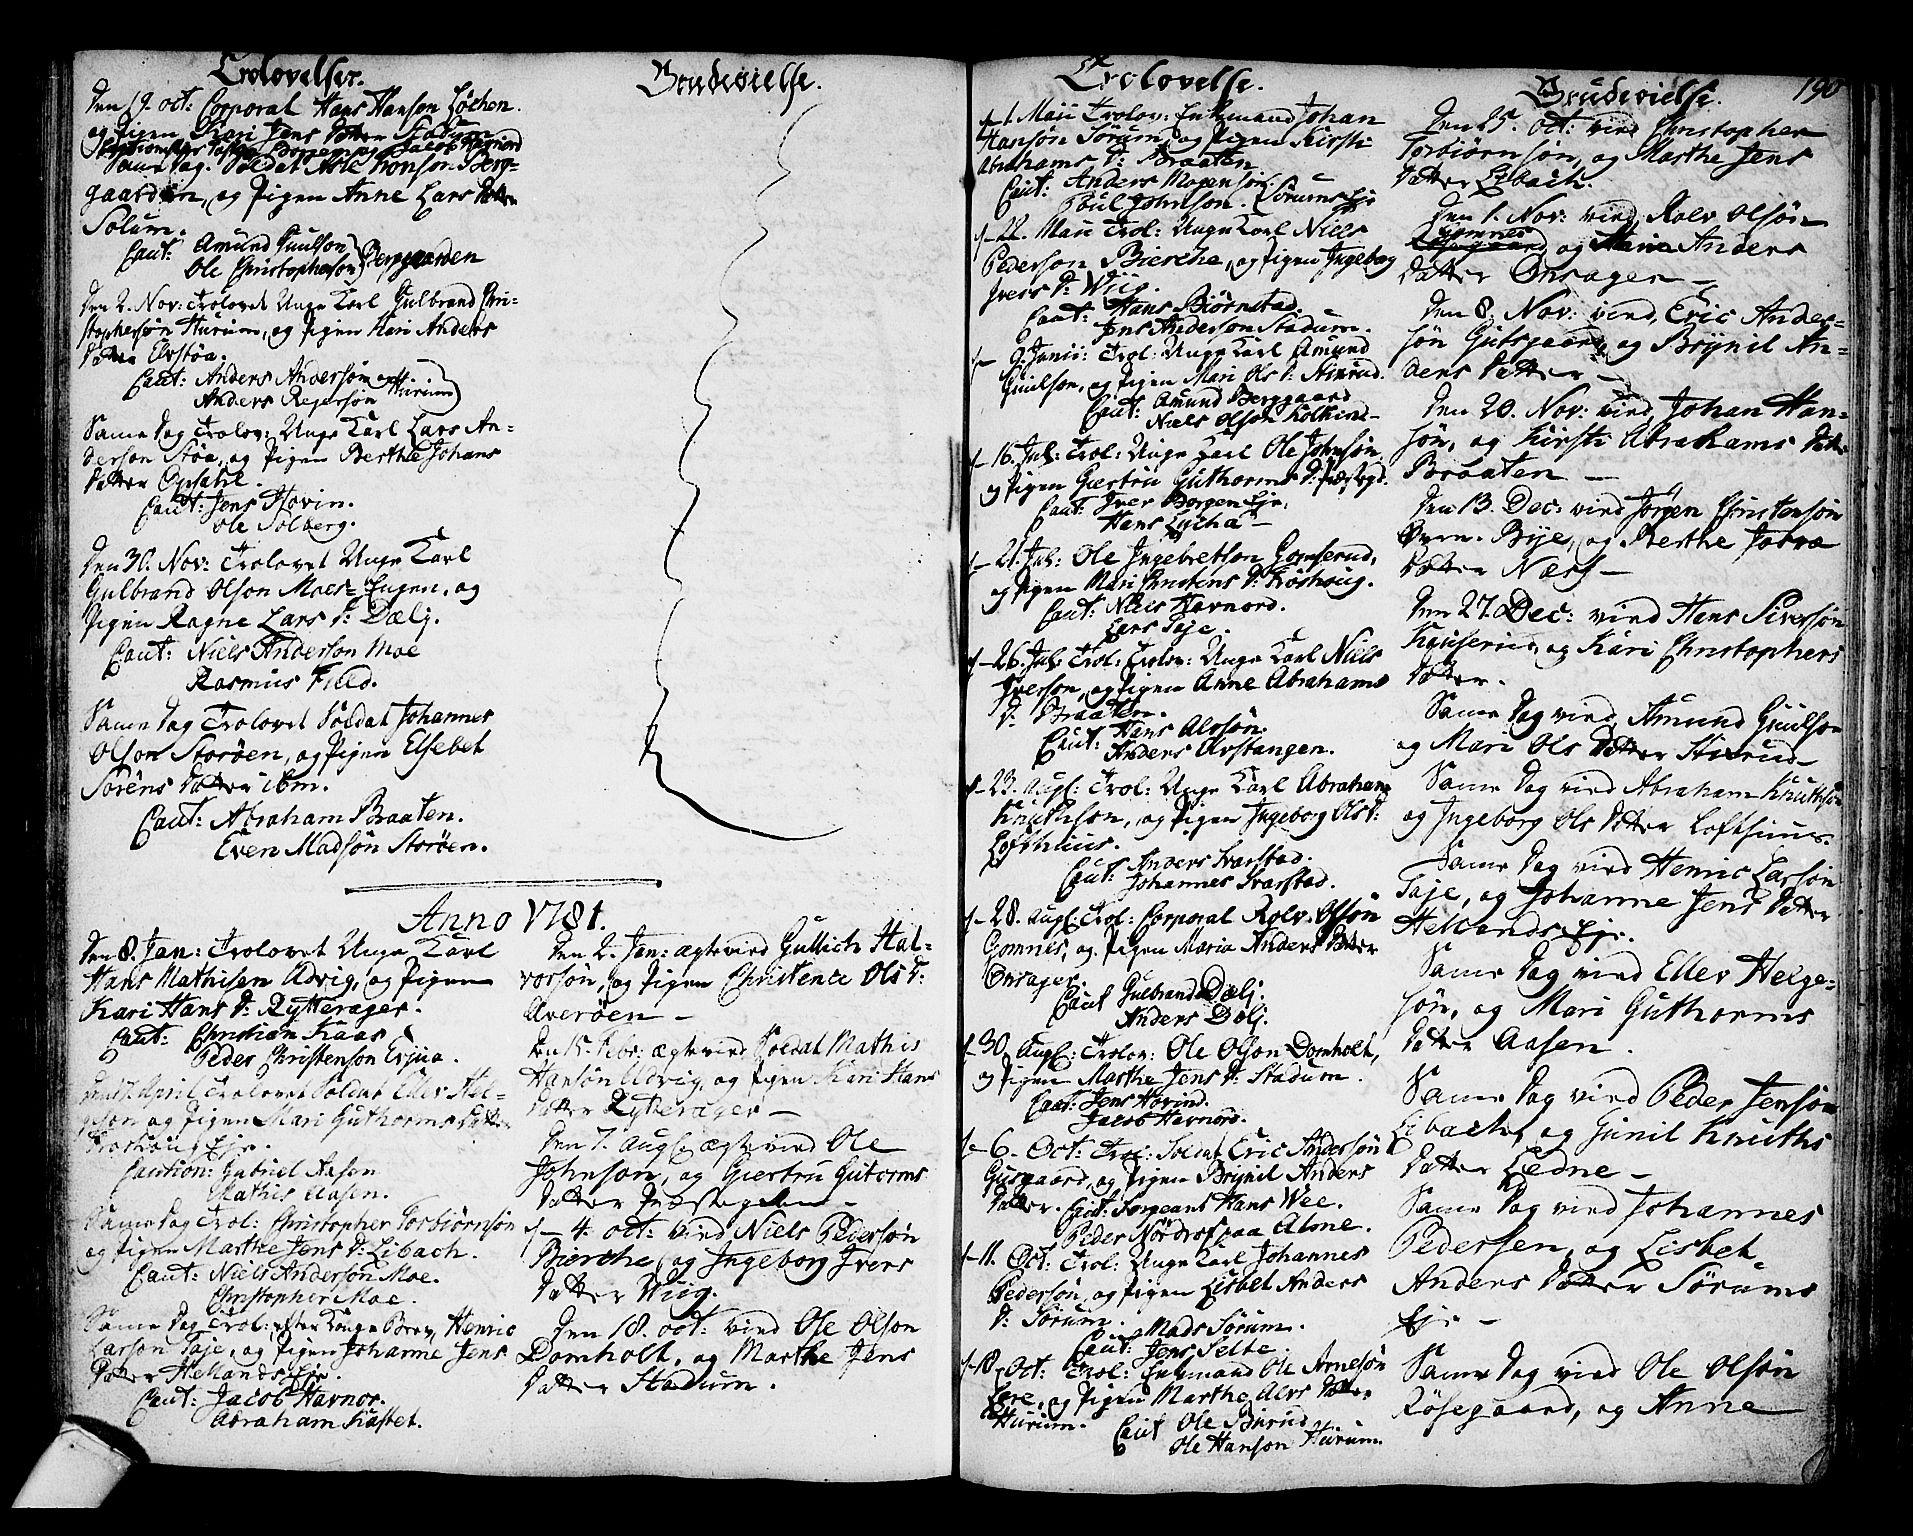 SAKO, Hole kirkebøker, F/Fa/L0002: Ministerialbok nr. I 2, 1766-1814, s. 190